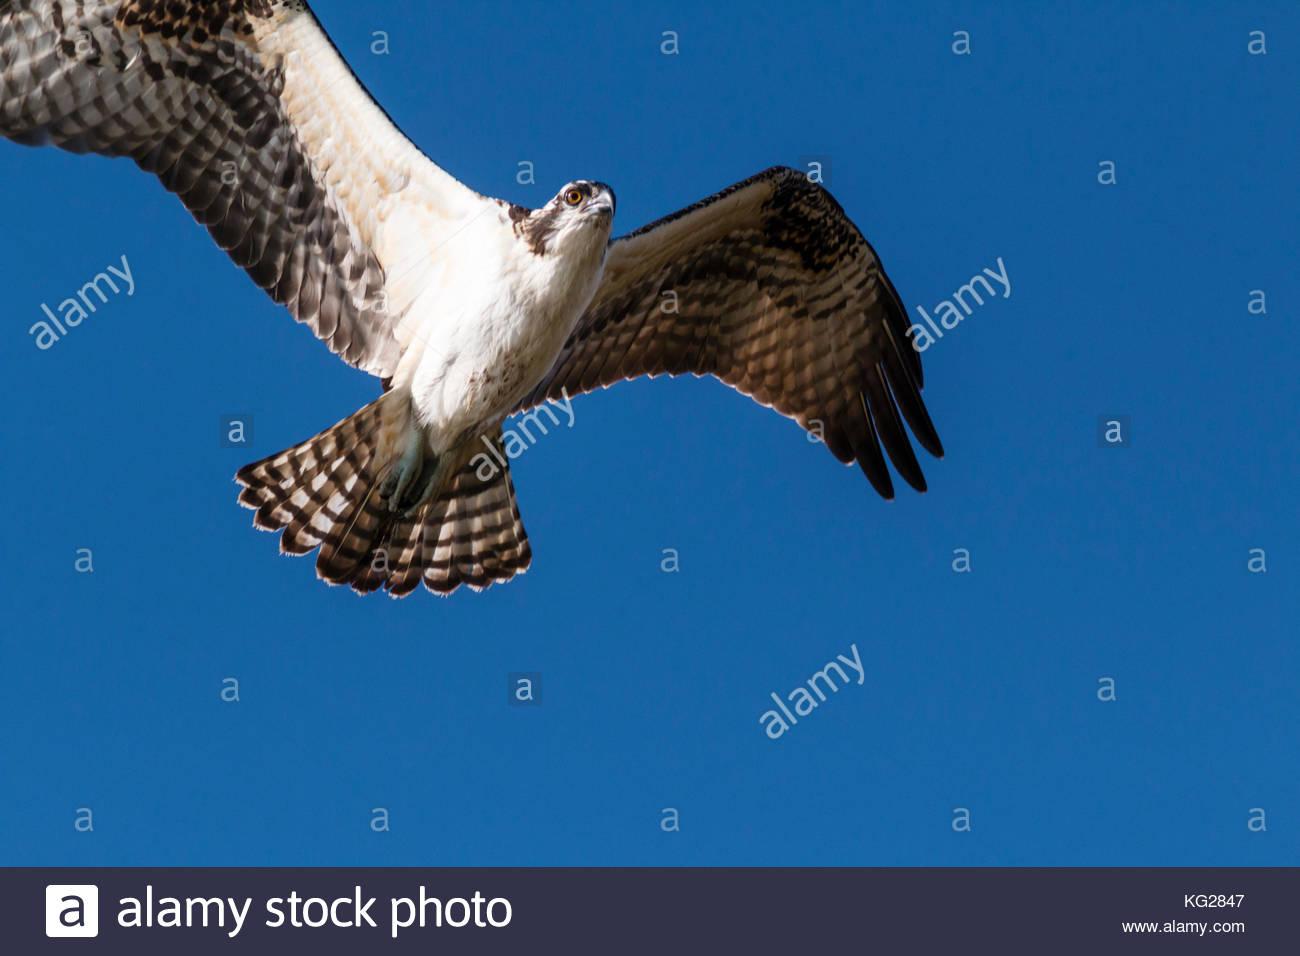 osprey-pandion-haliaetus-in-flight-new-mexico-usa-KG2847.jpg